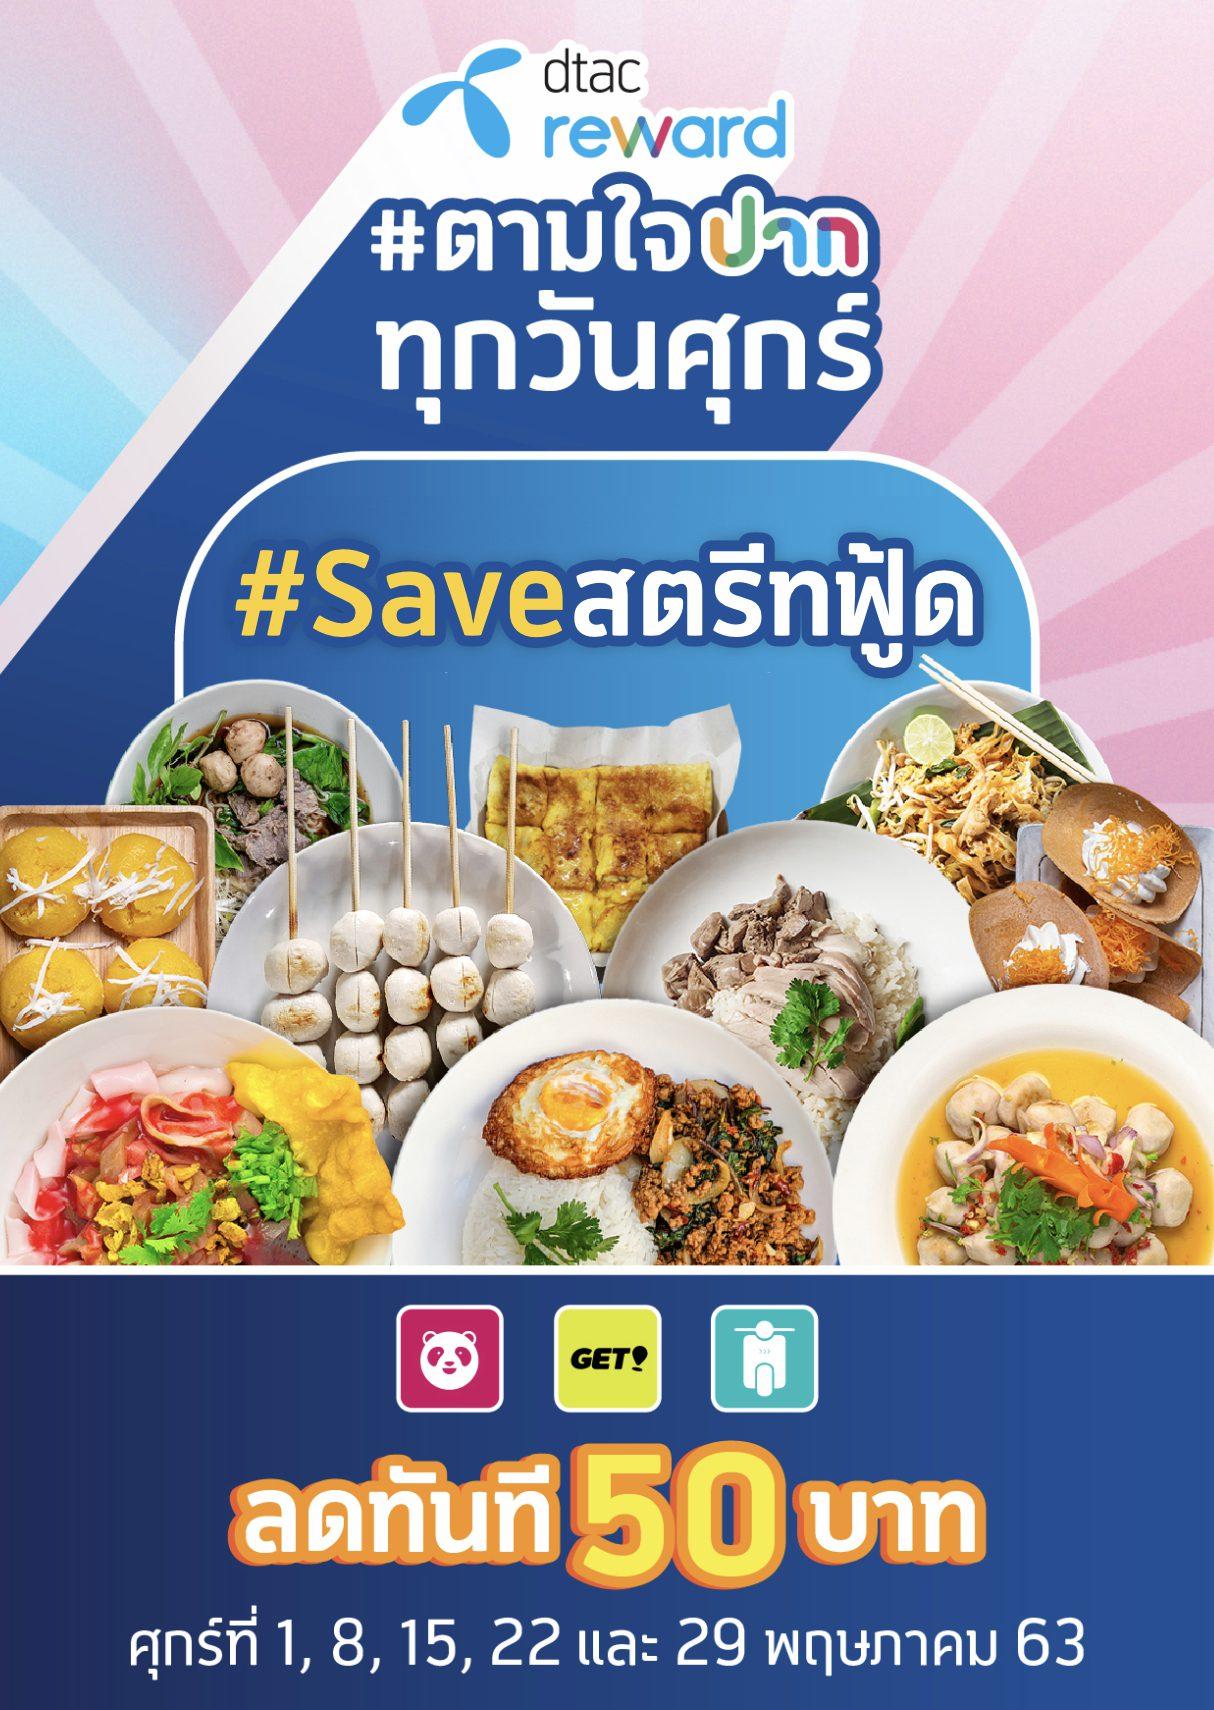 #Saveสตรีทฟู้ด ดีแทค รีวอร์ด ช่วยสนับสนุนพ่อค้าแม่ค้า ร้านอาหารริมทาง เพิ่มรายได้ สู้โควิด-19